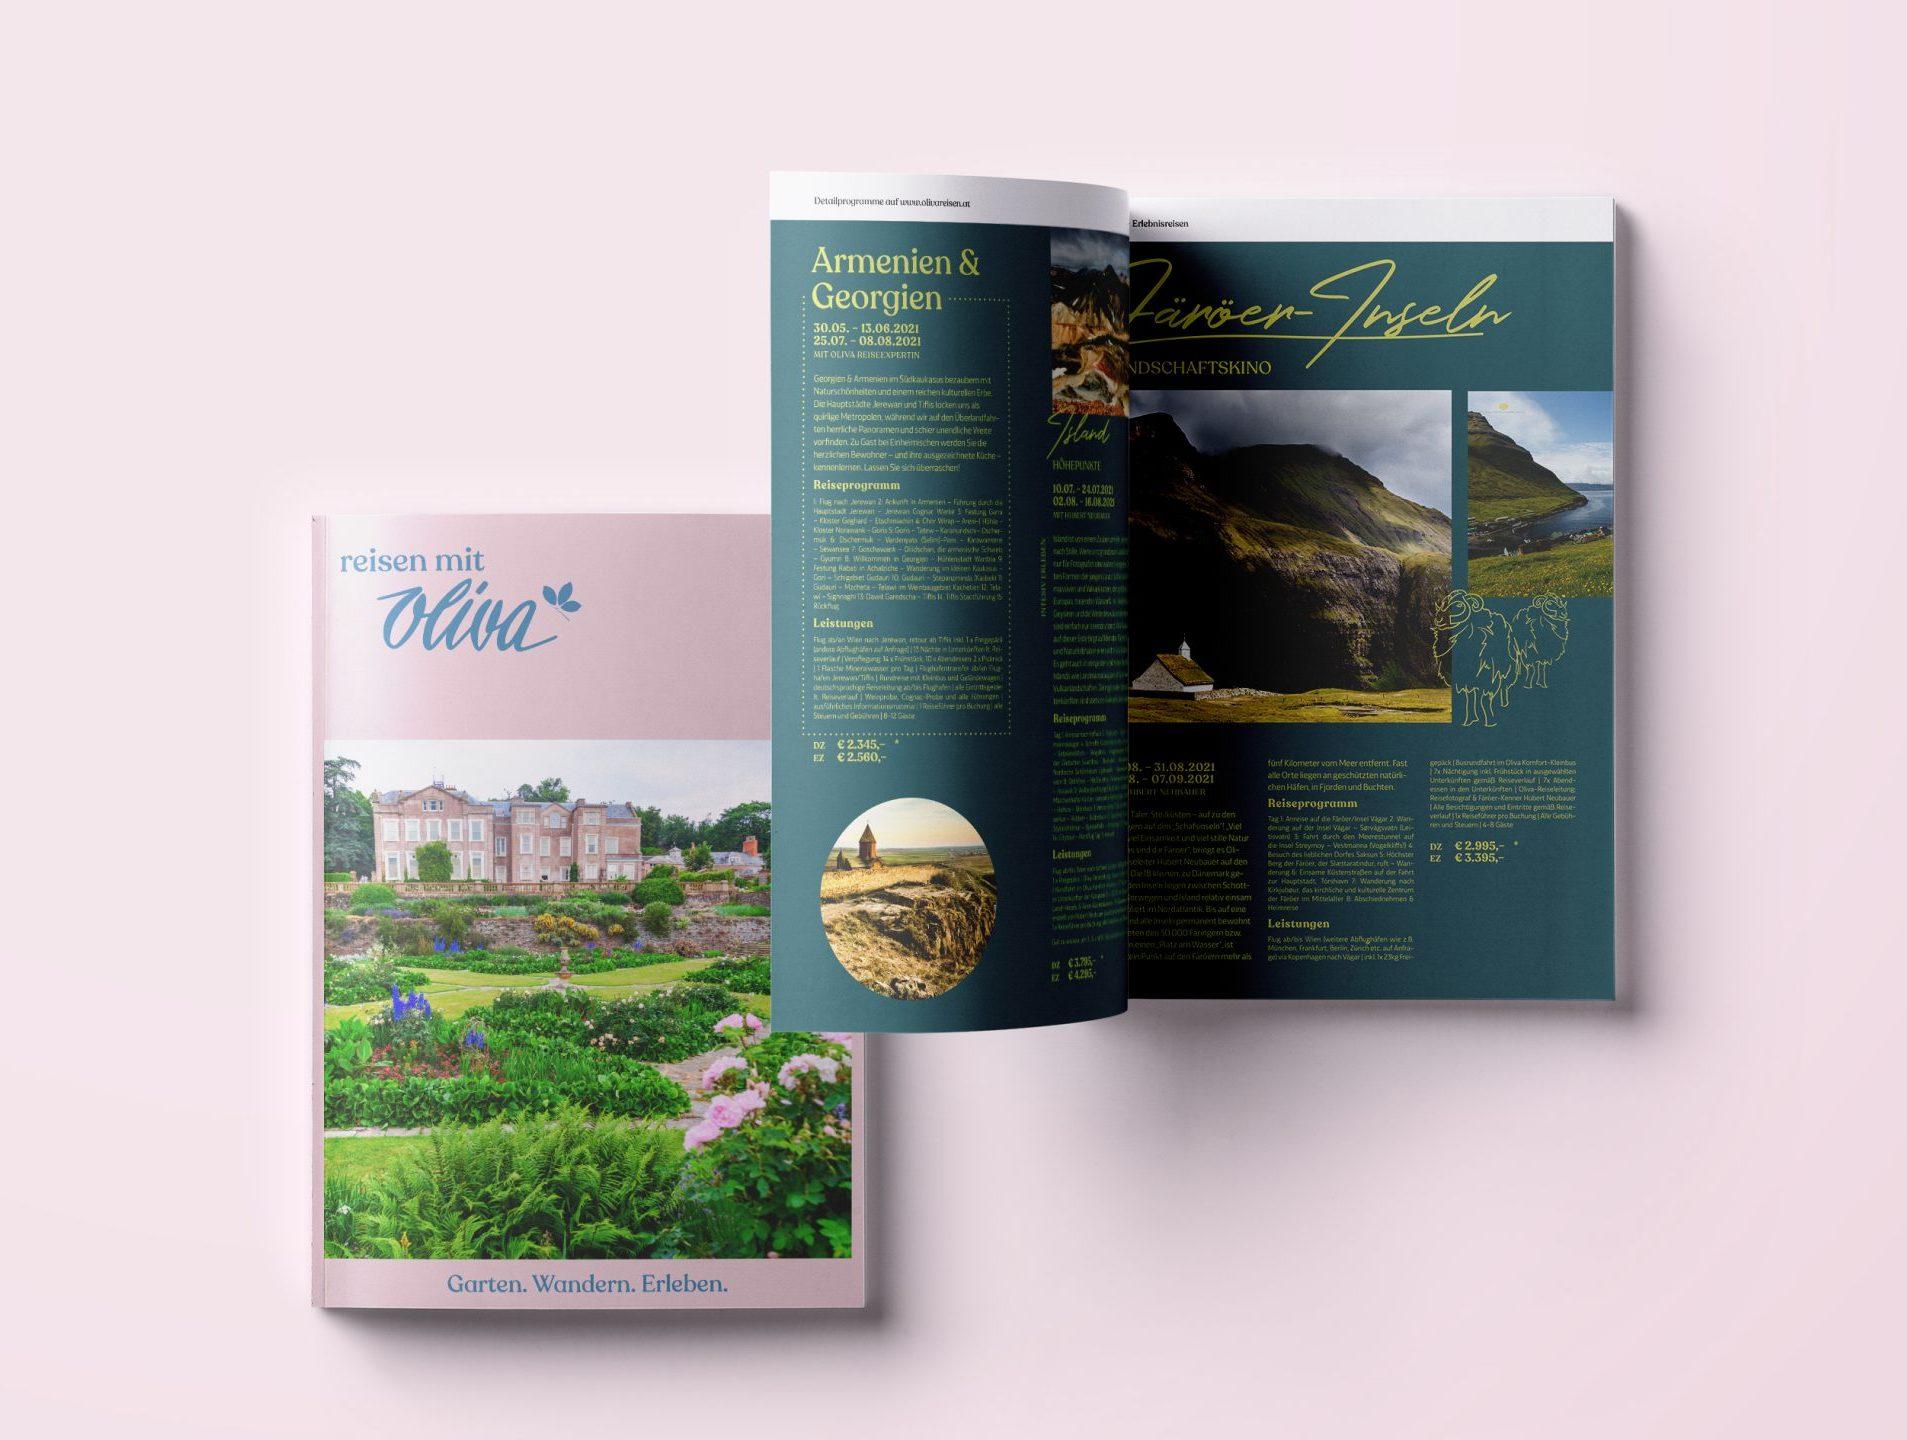 A4-Magazine-Booklet-Mockup-OR-Hauptkatalog